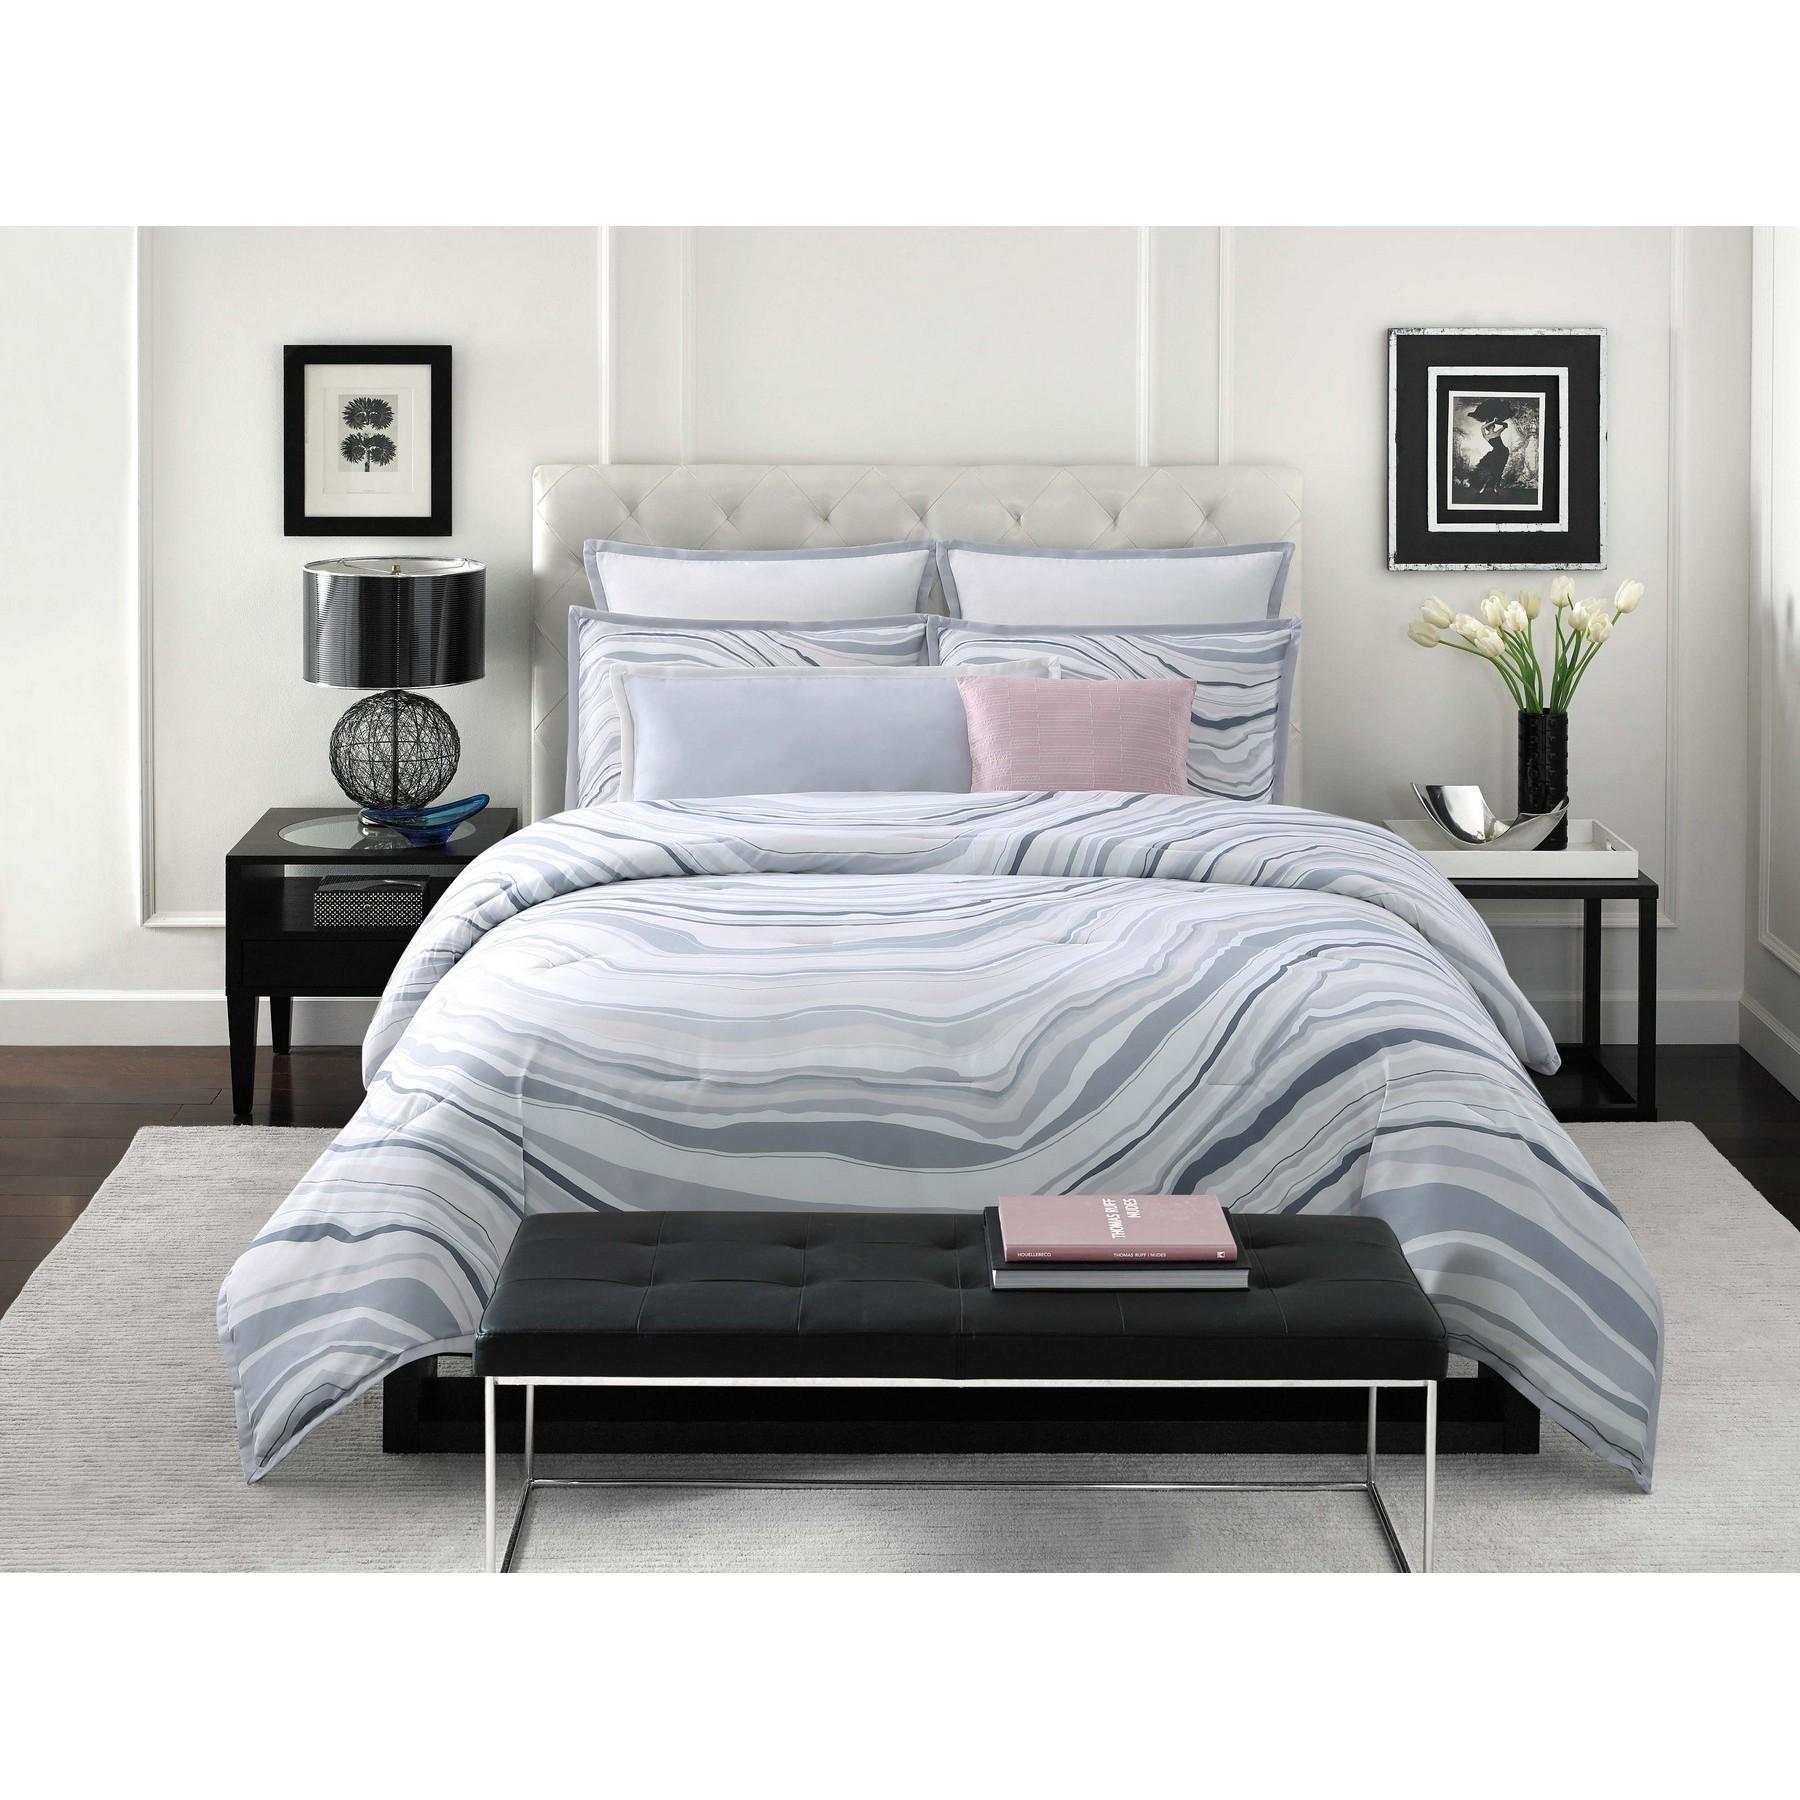 comforter only comp bedding p desktop zoom product a collection vince croscill layer belk online dwp camuto src devon